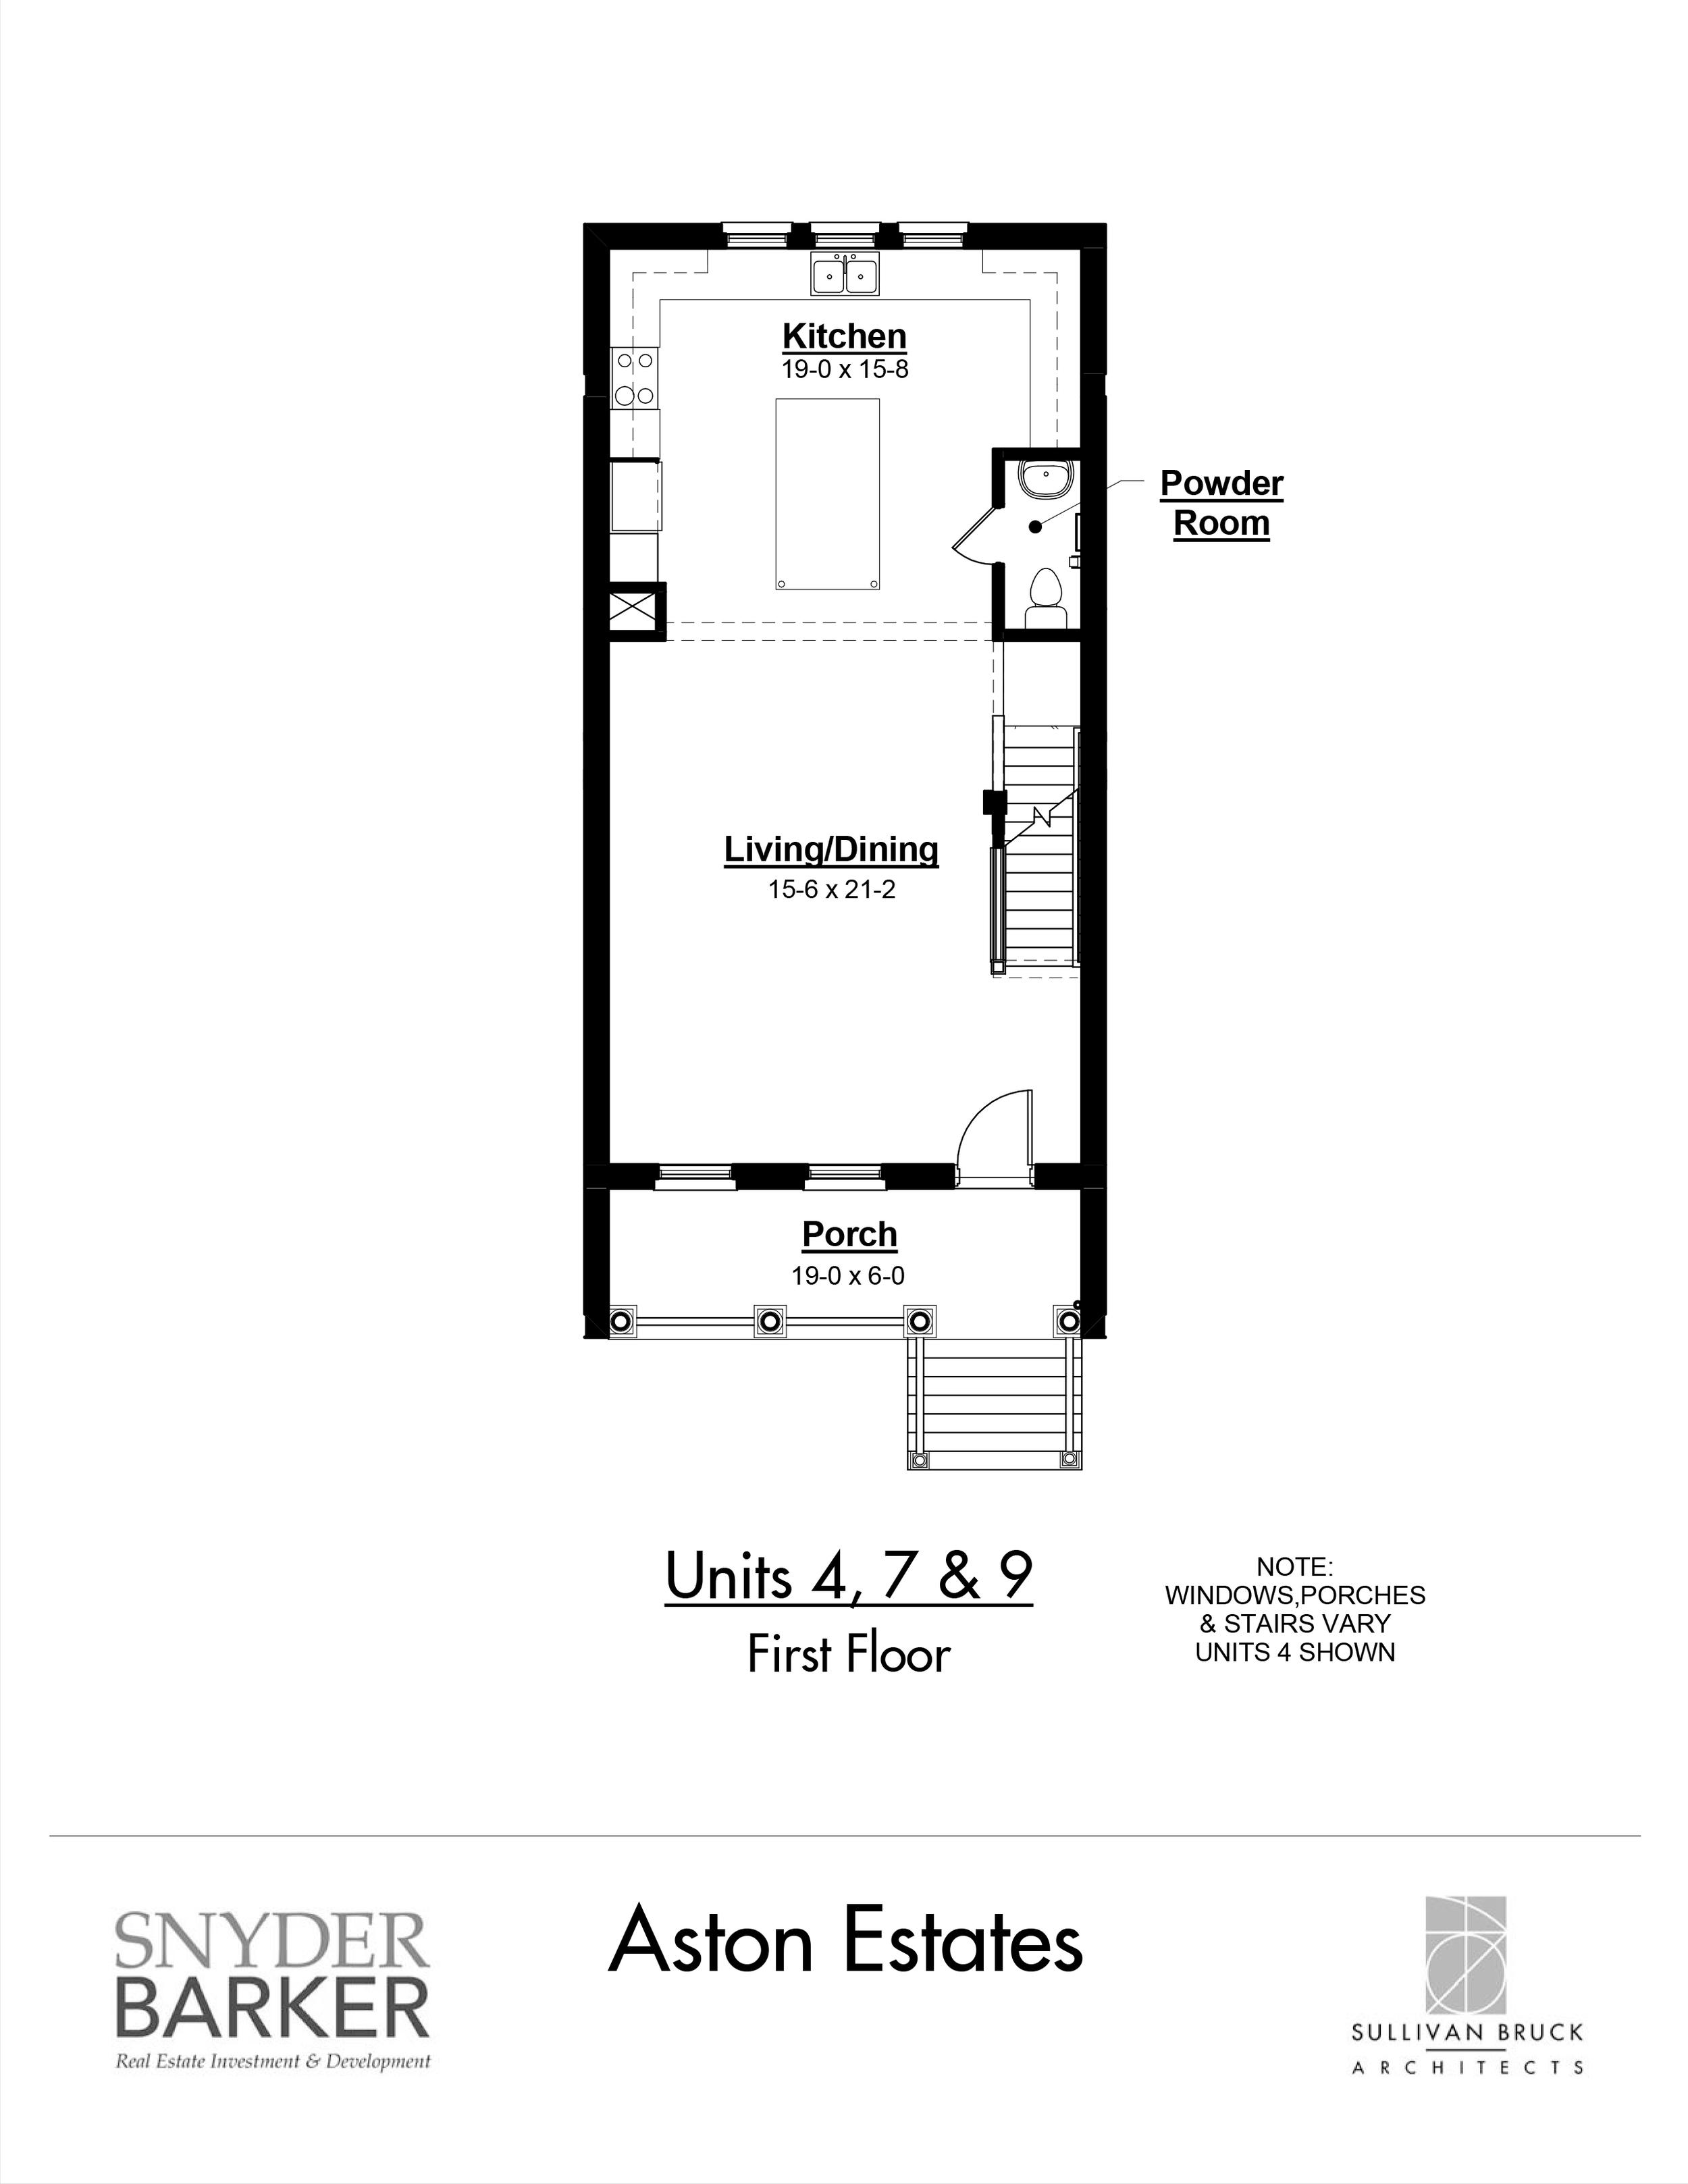 Aston_Estates_Unit_4_7_9_First_Floor.jpg